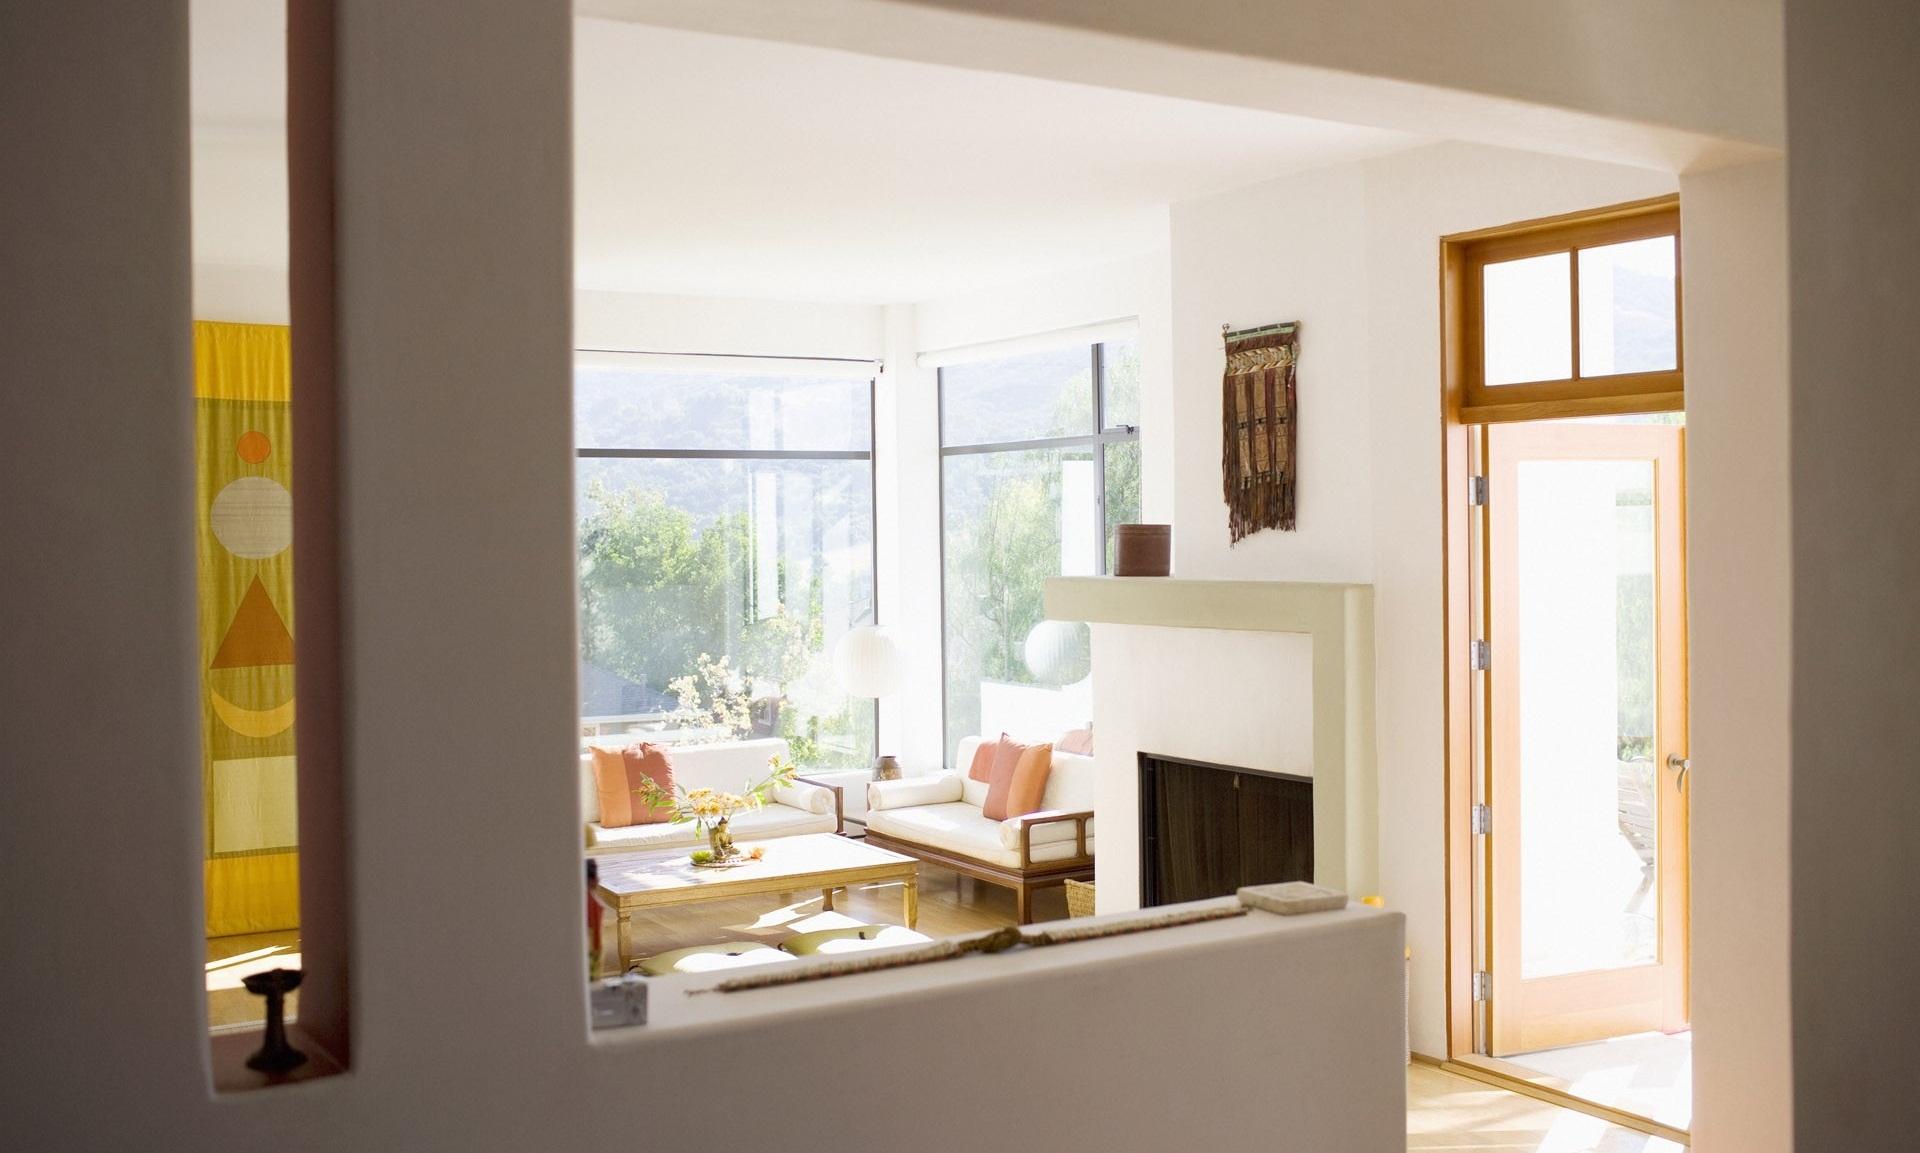 Porta Finestra Ingresso Casa sfondi : finestra, camera, casa, porta, interior design